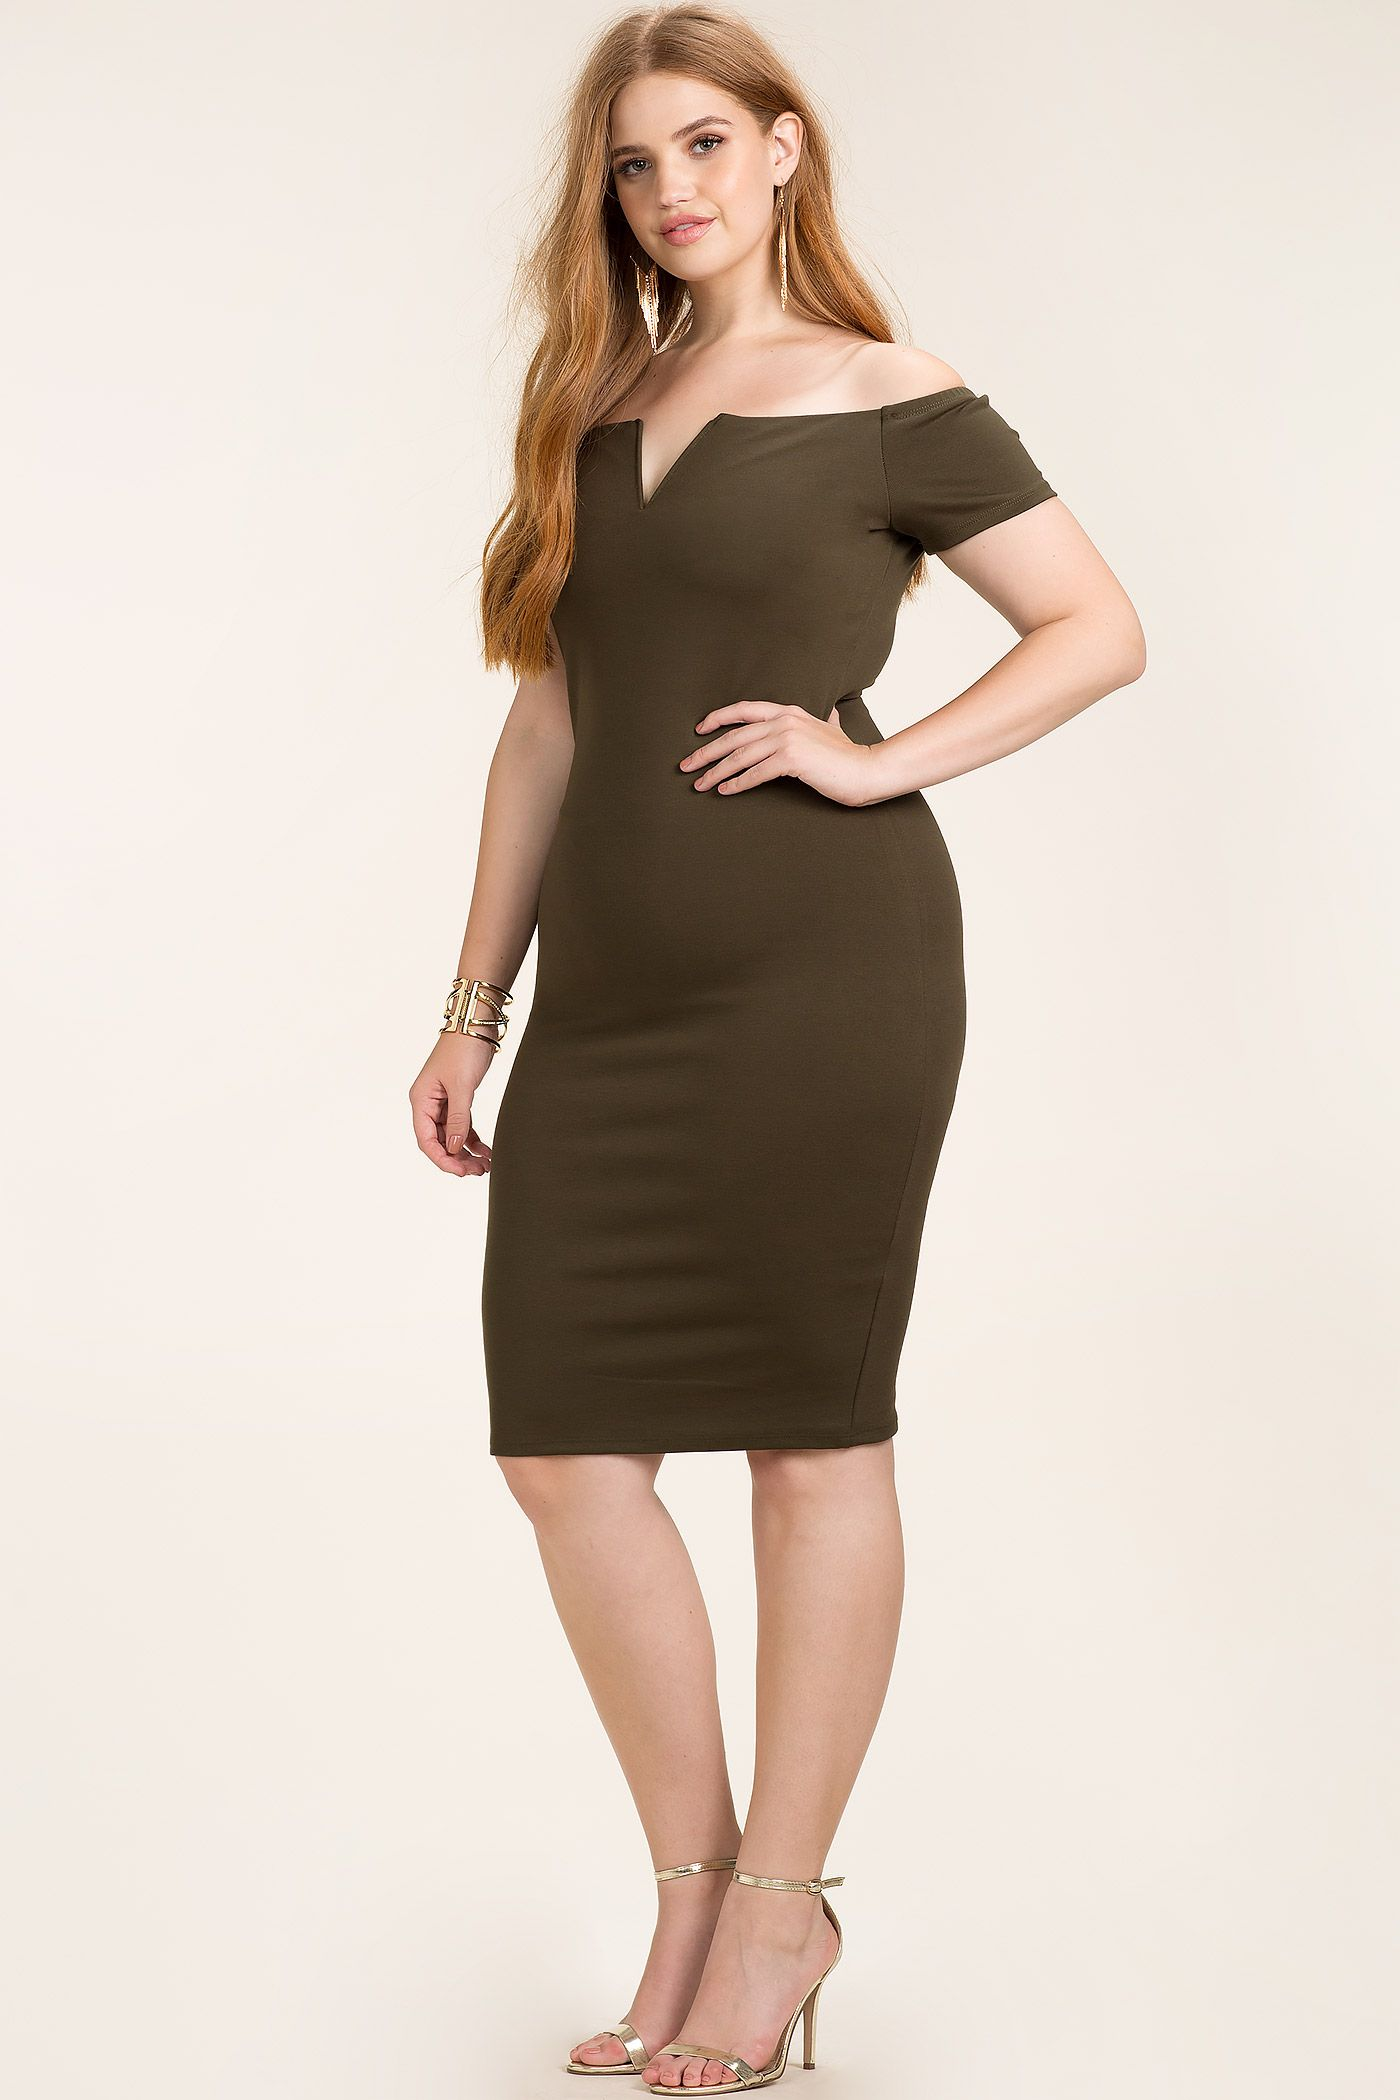 8bfa9e8101 Women s Plus Size Bodycon Dresses